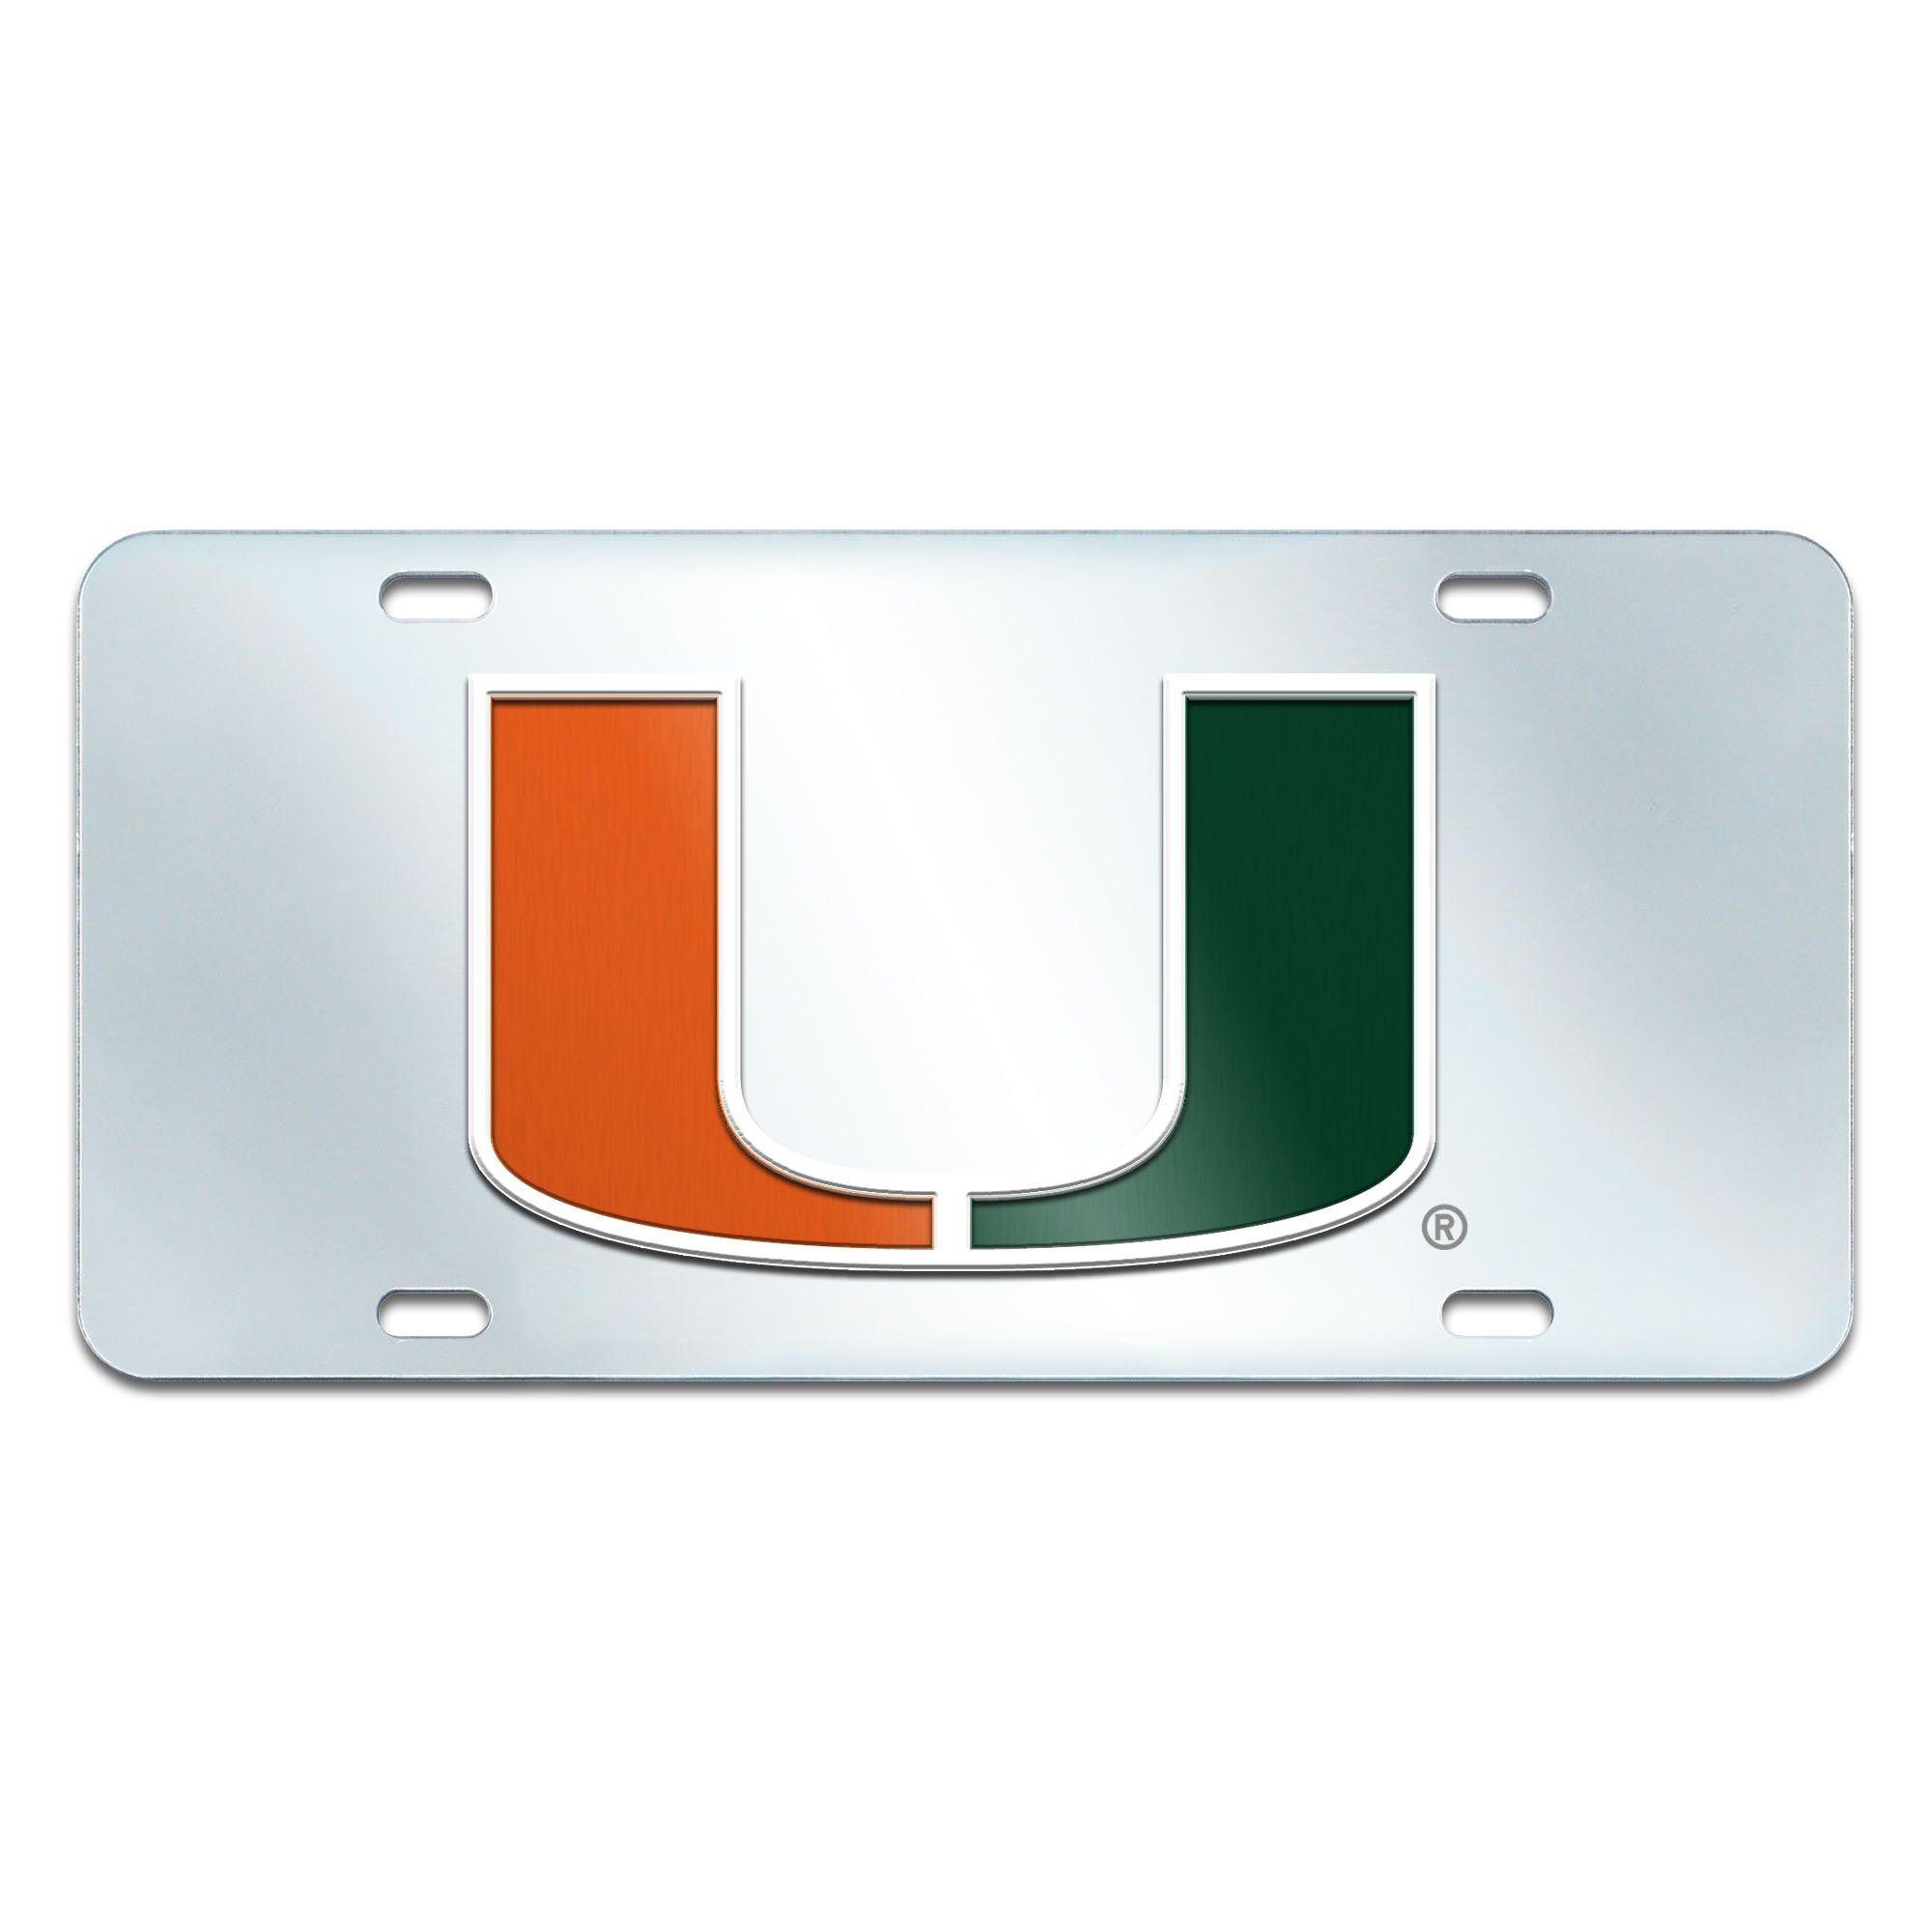 Fanmats NCAA University of Miami Hurricanes Plastic License Plate (Inlaid)